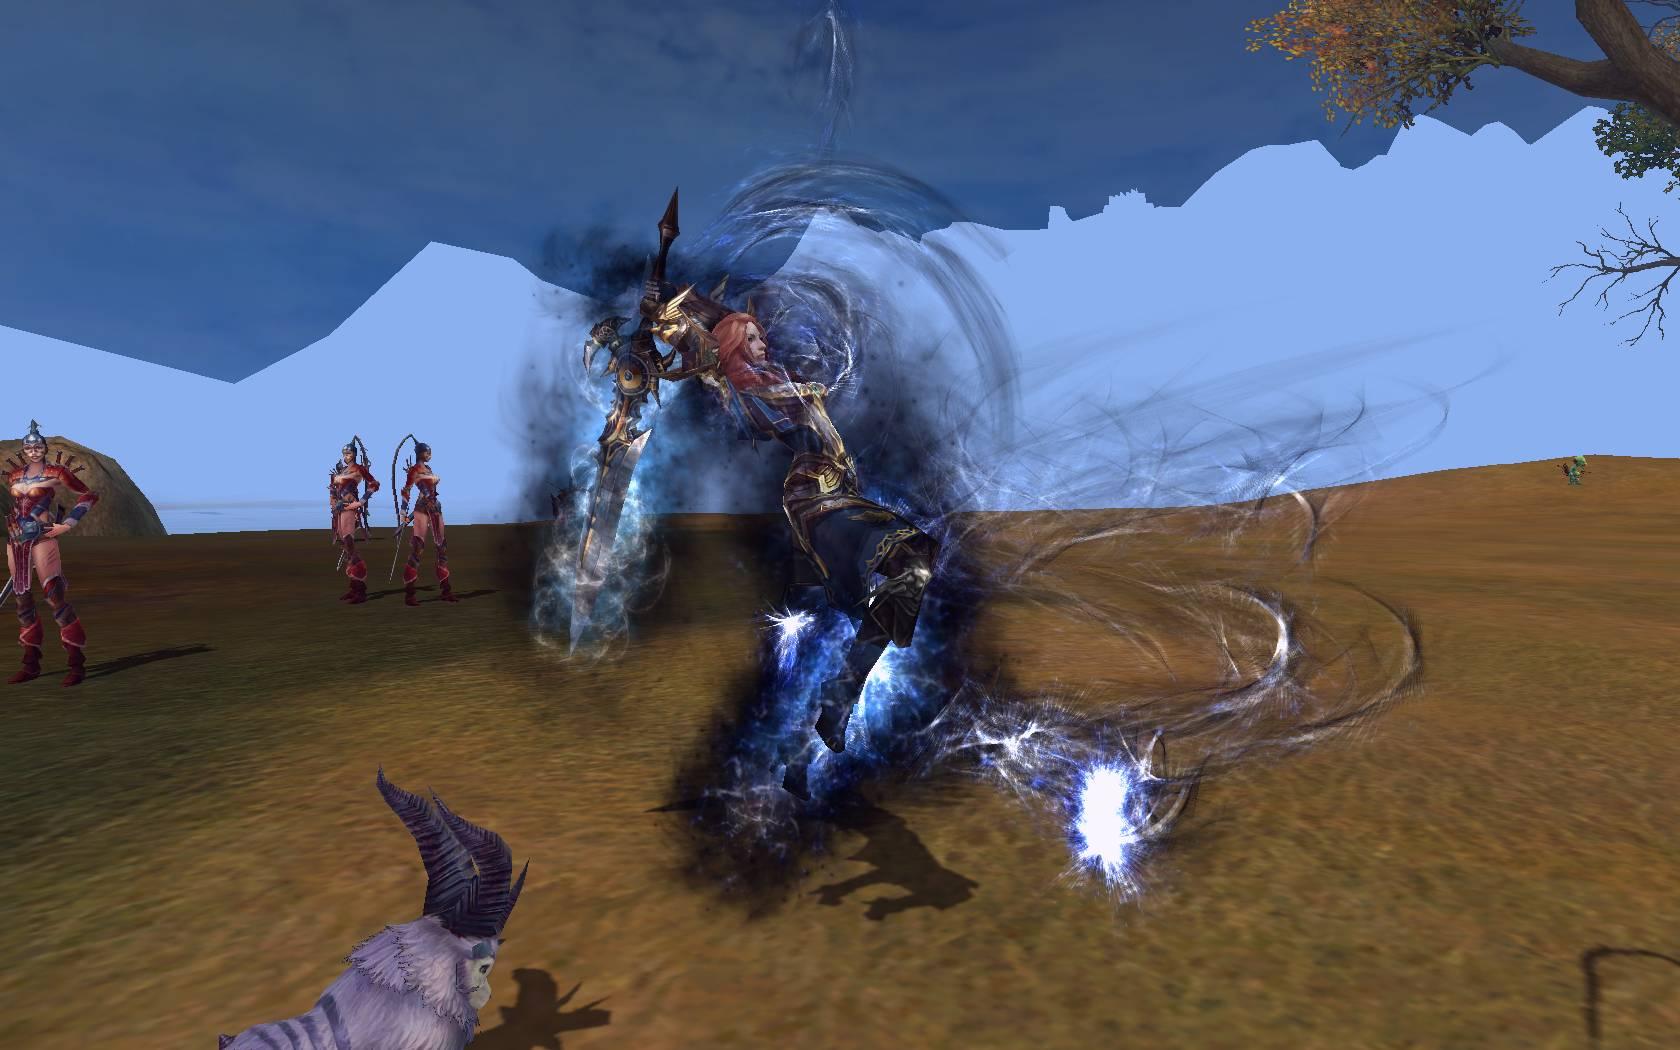 Click image for larger version.Name:Warriorclass Forsaken World09.jpgViews:168Size:157.3 KBID:1054